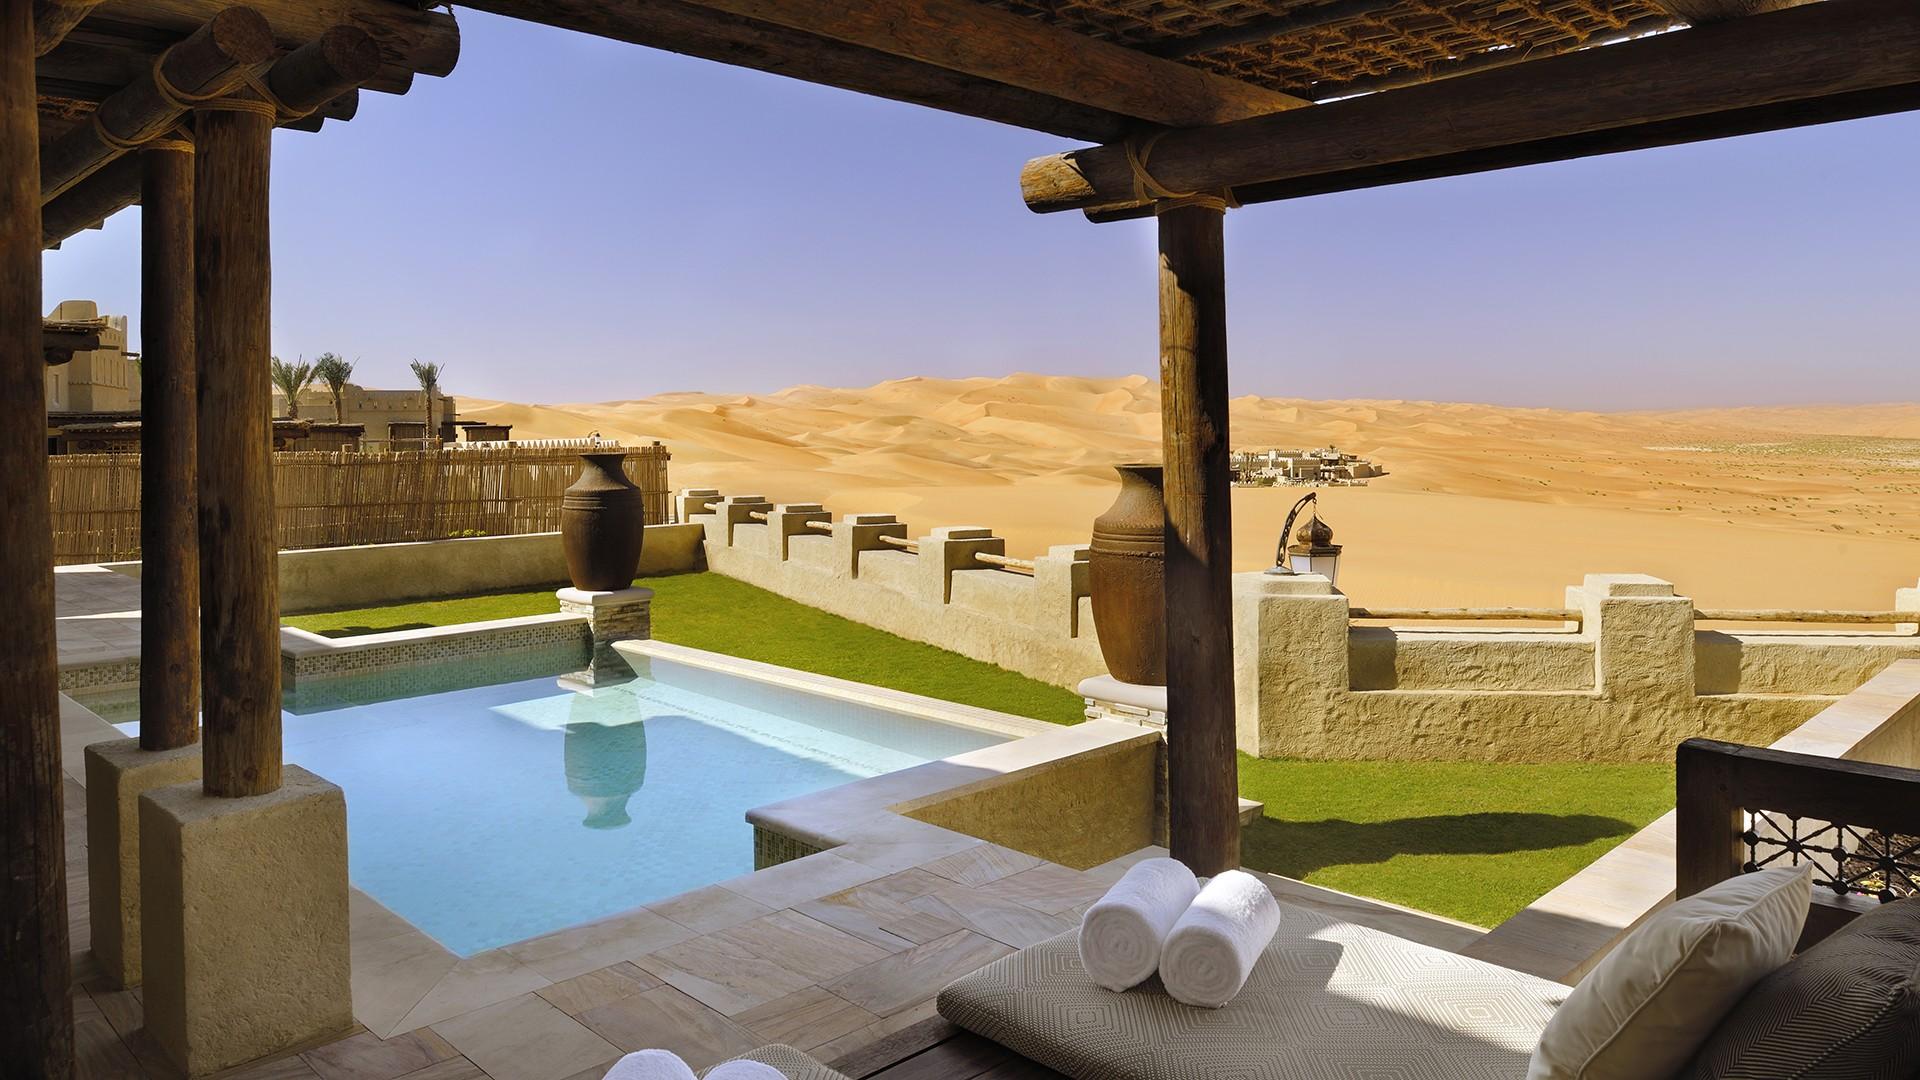 Anantara family pool villa, Qasr Al Sarab by Anantara in the Liwa Desert